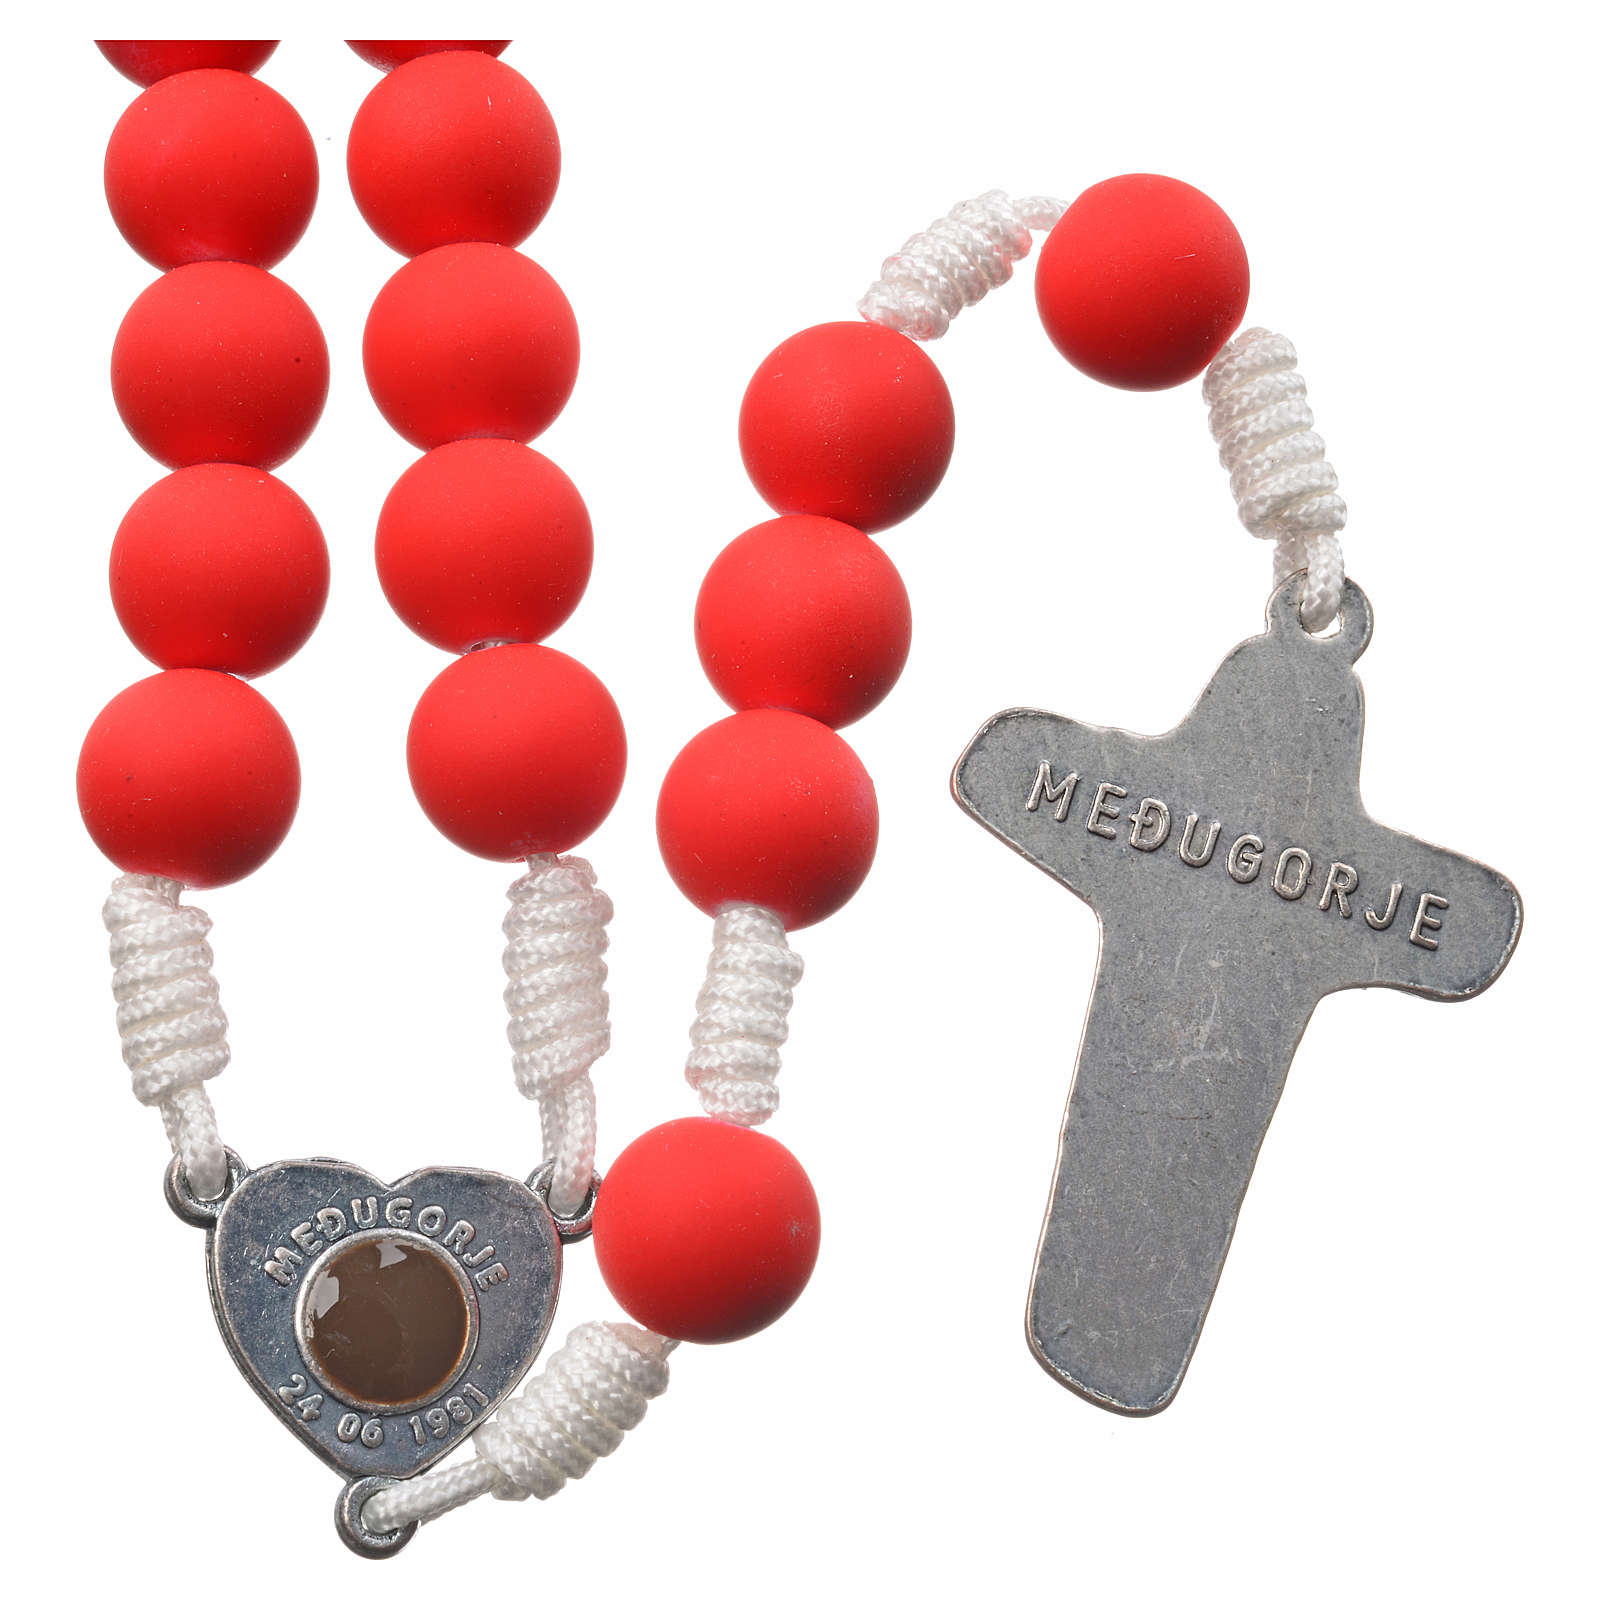 Medjugorje rosary in red fimo with Medjugorje soil 4